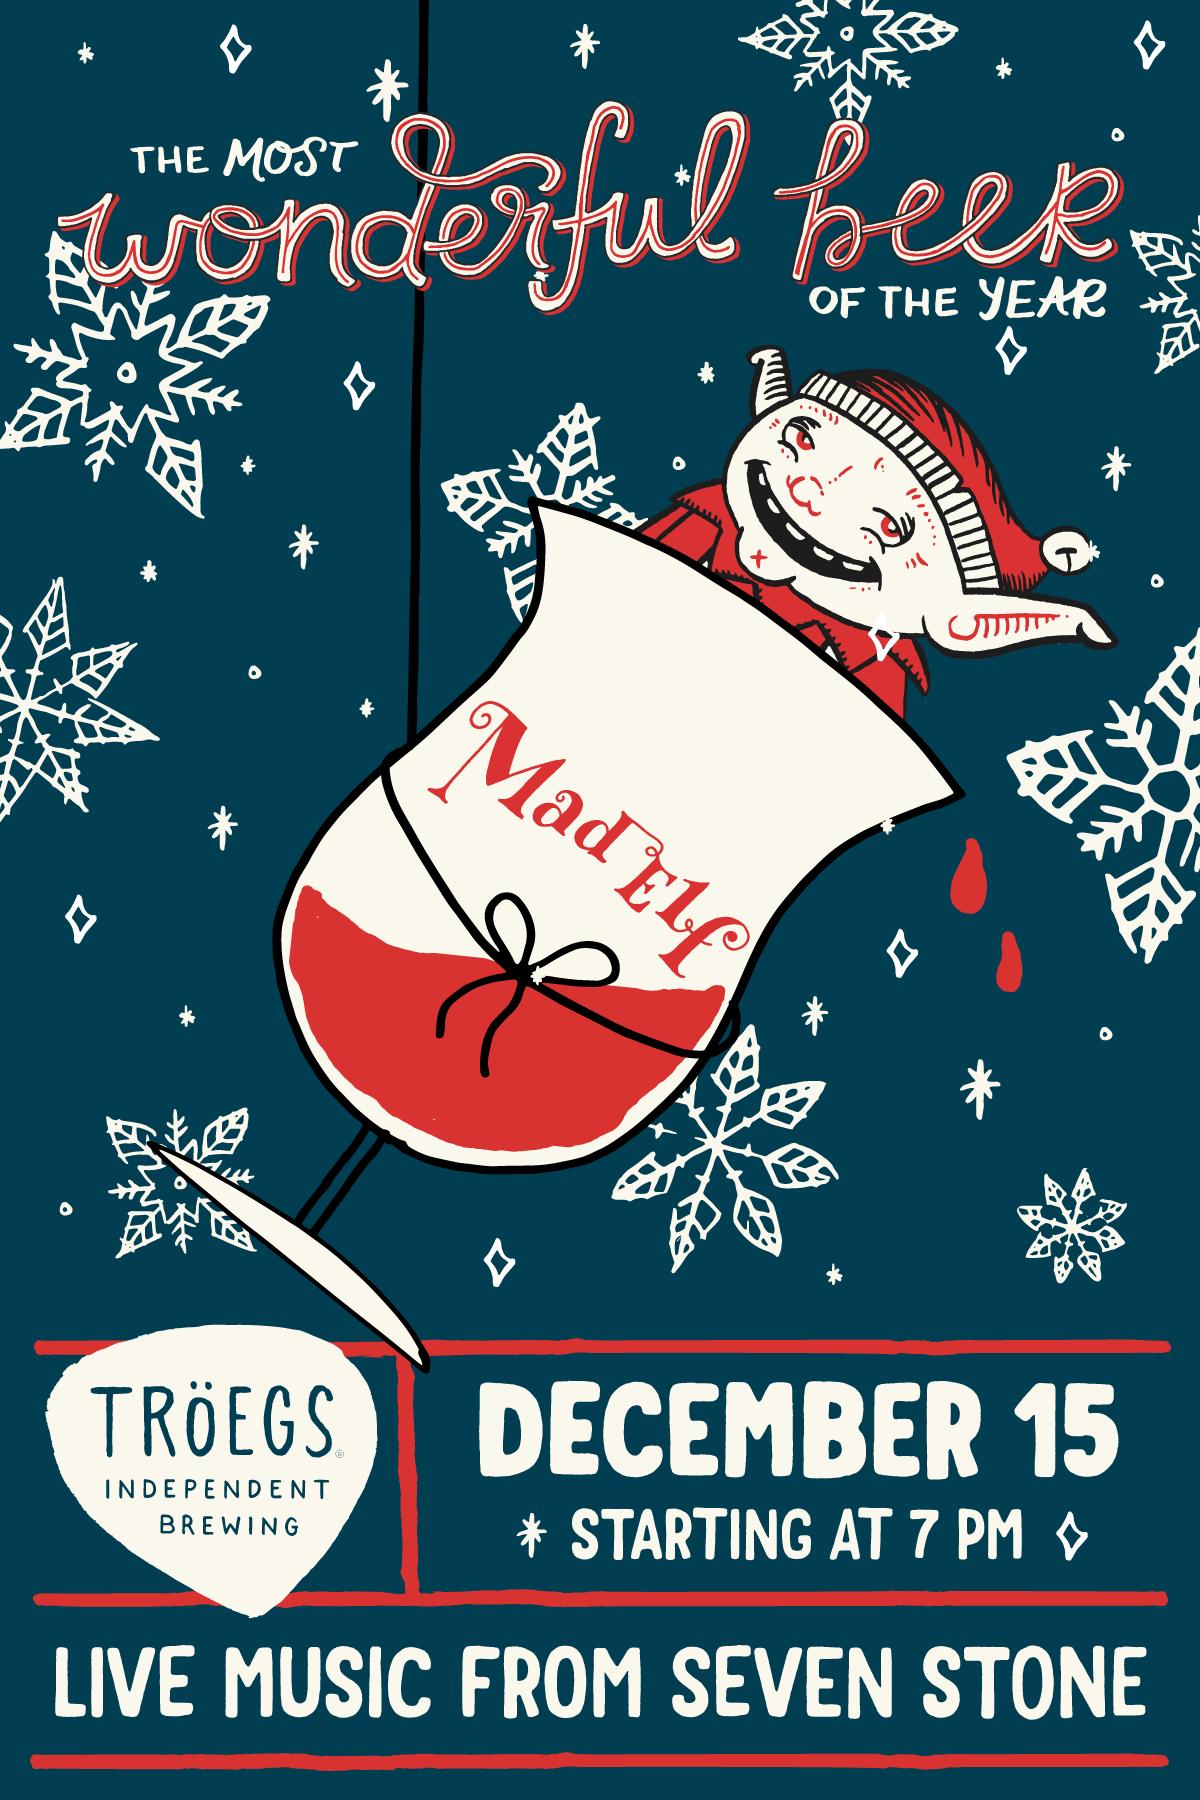 brick-house-pub_troegs-mad-elf-night-posters_10-25-18